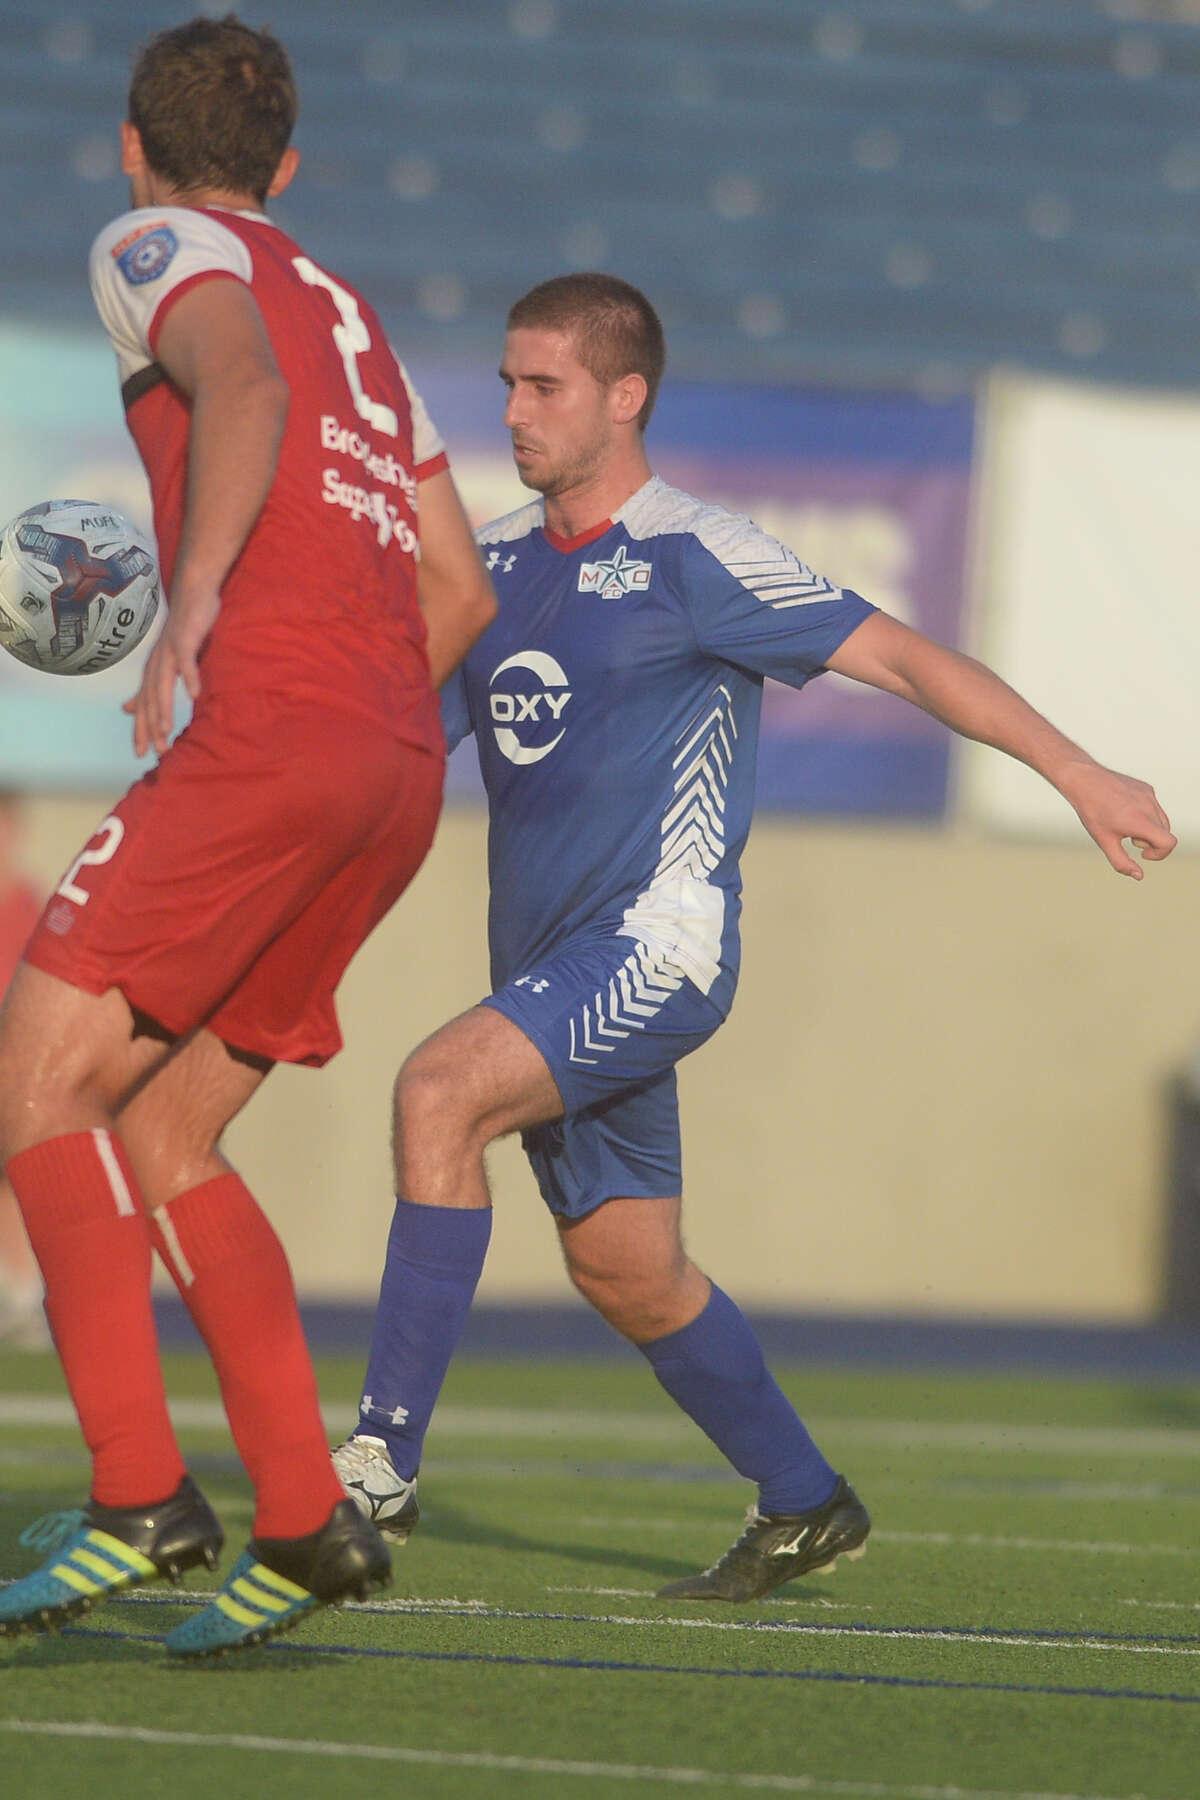 Midland-Odessa FC's Jamie O'Grady (16) kicks against Tyler FC on Friday, July 7, 2017, at Grande Communications Stadium. James Durbin/Reporter-Telegram